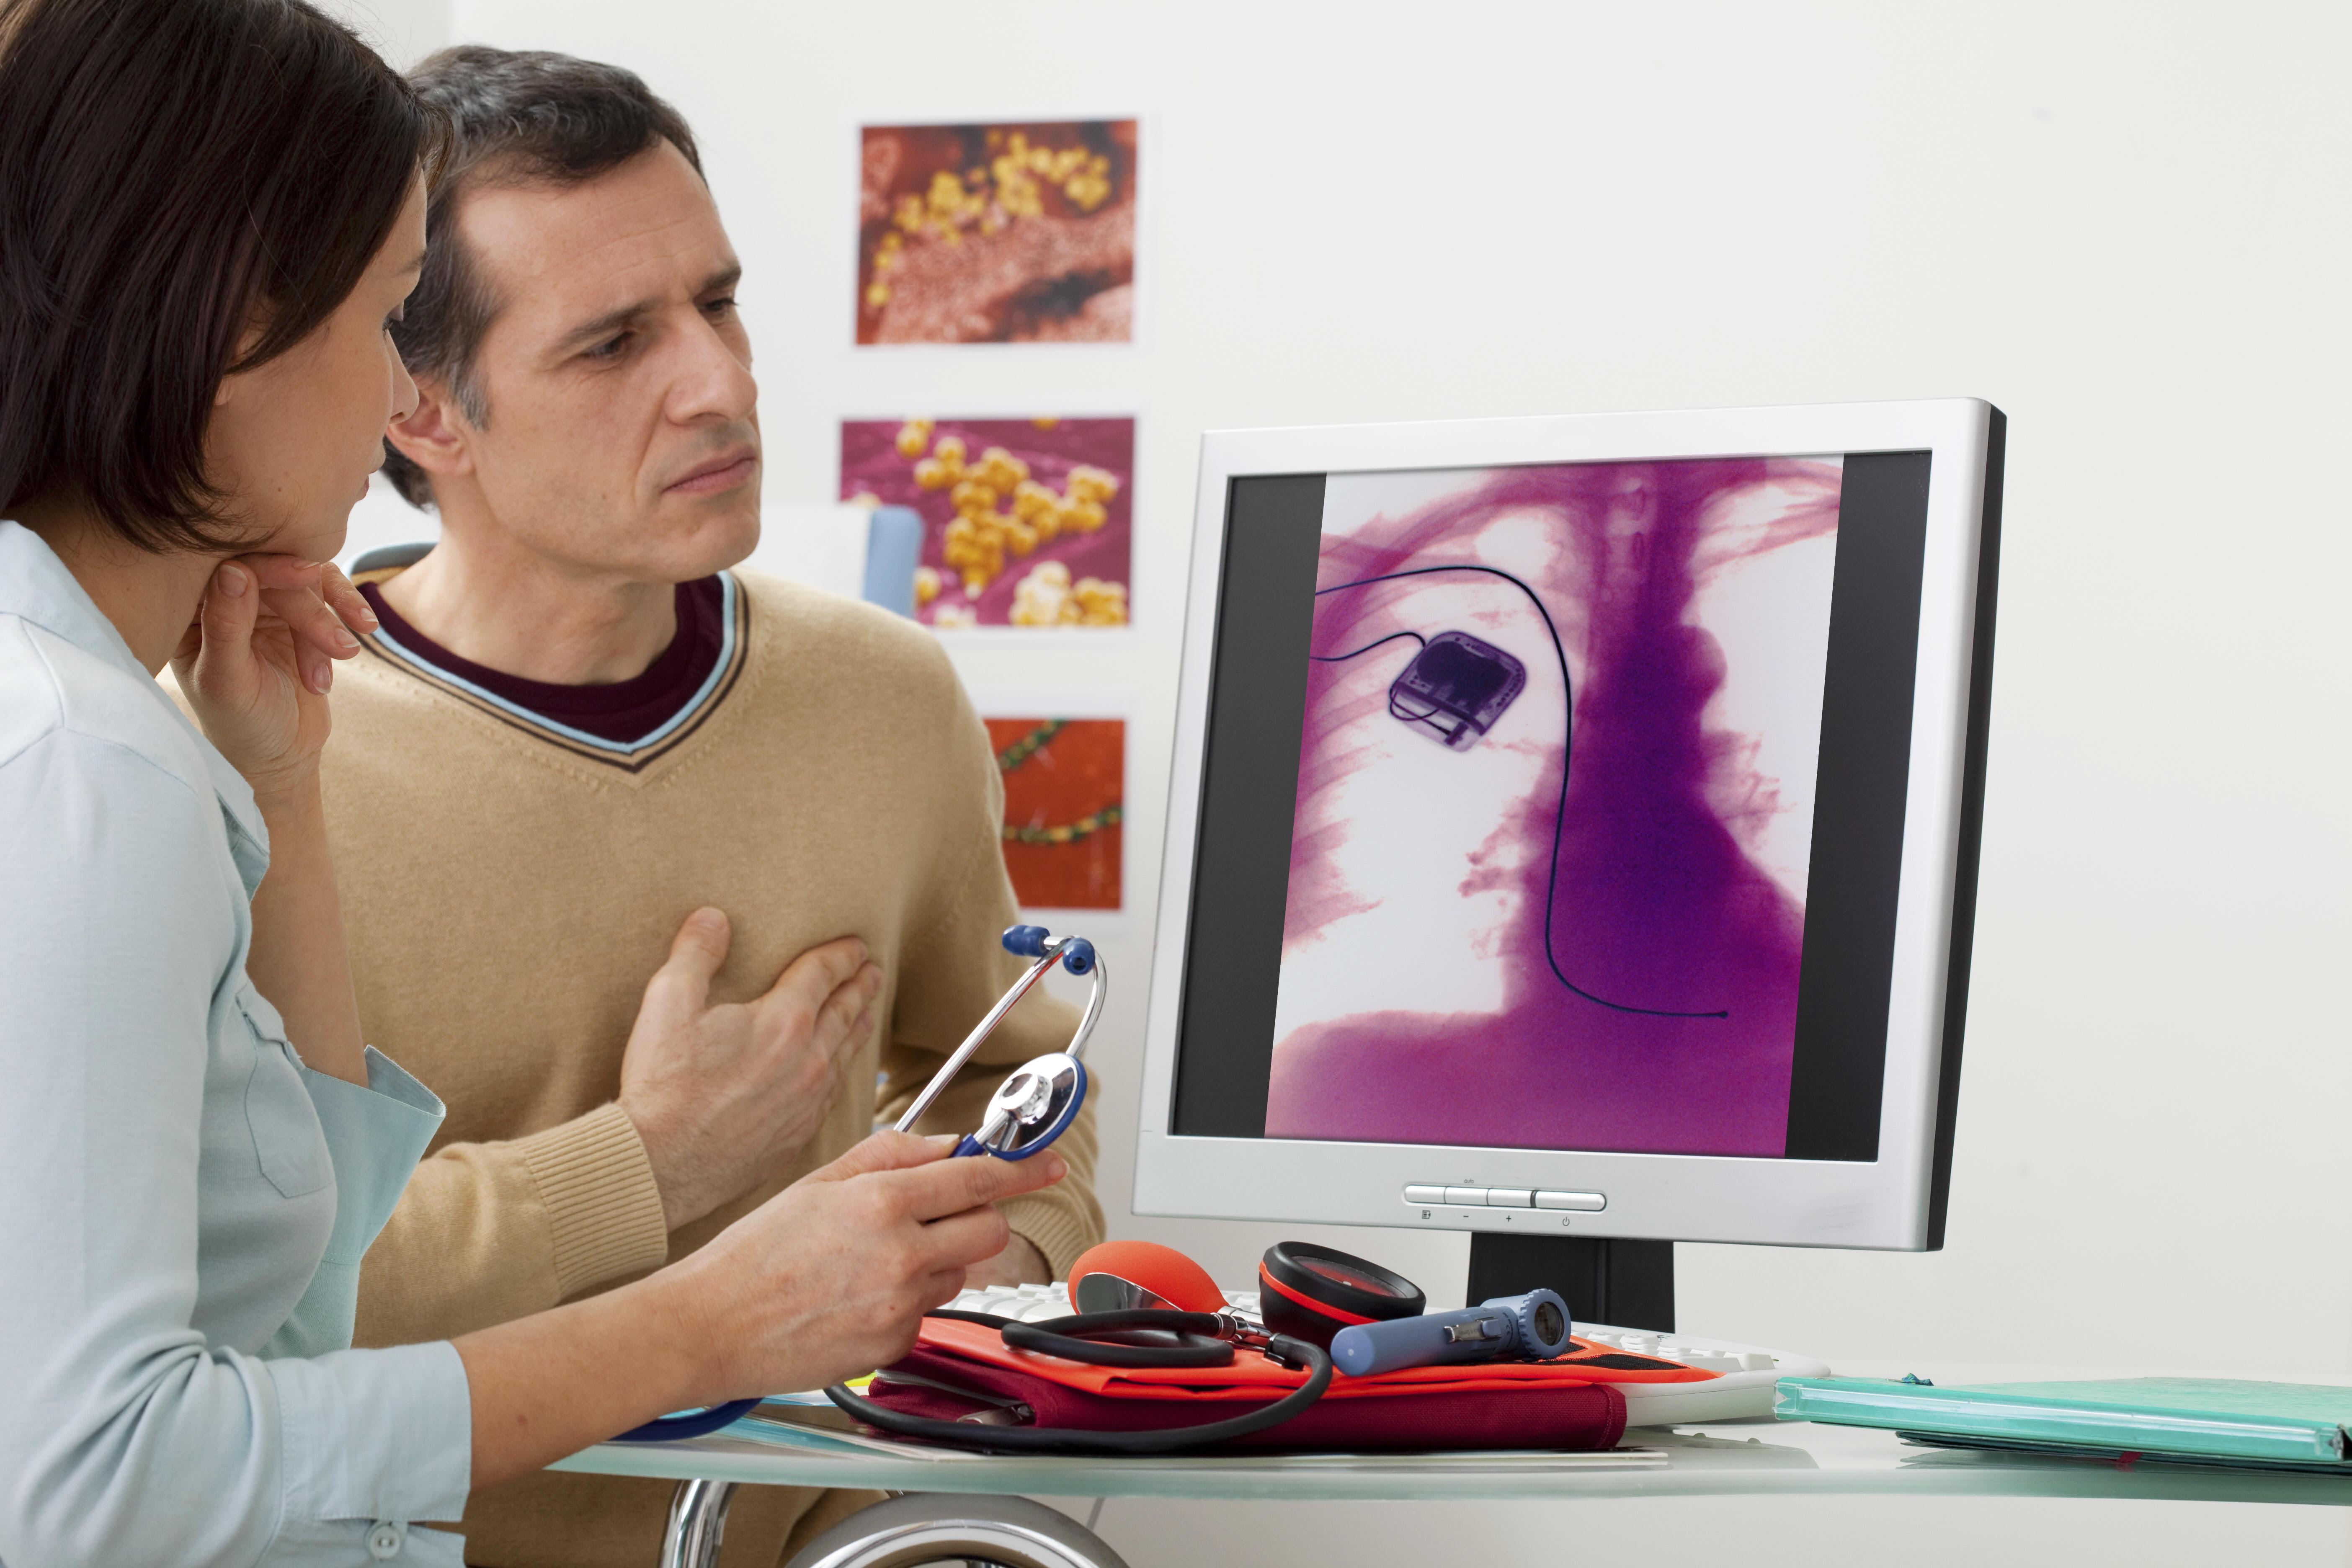 pacient kontroluje svoj kardiostimulátor u doktorky na počítači